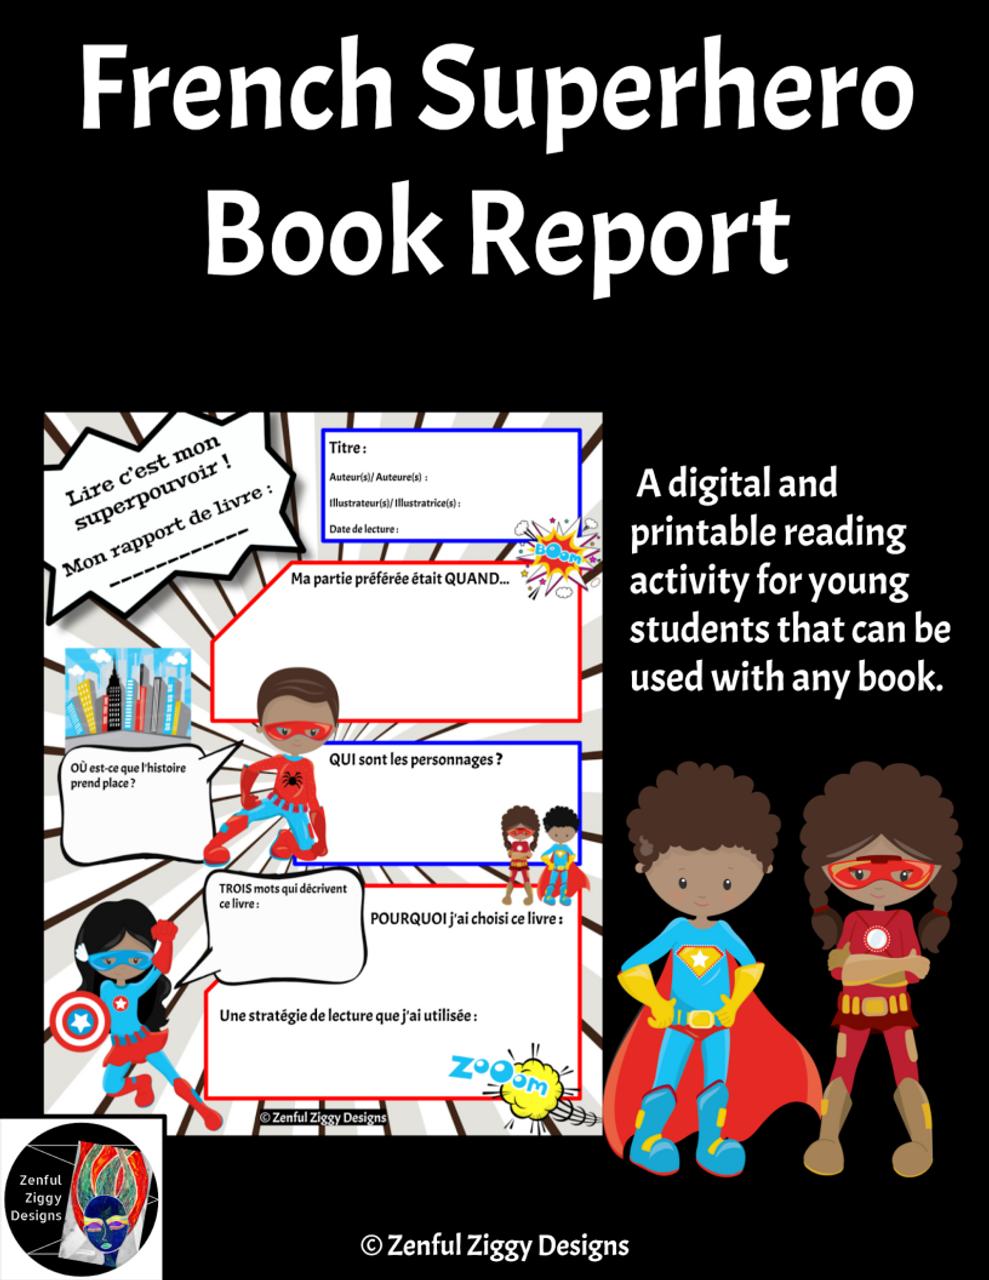 French Superhero Book Report 2